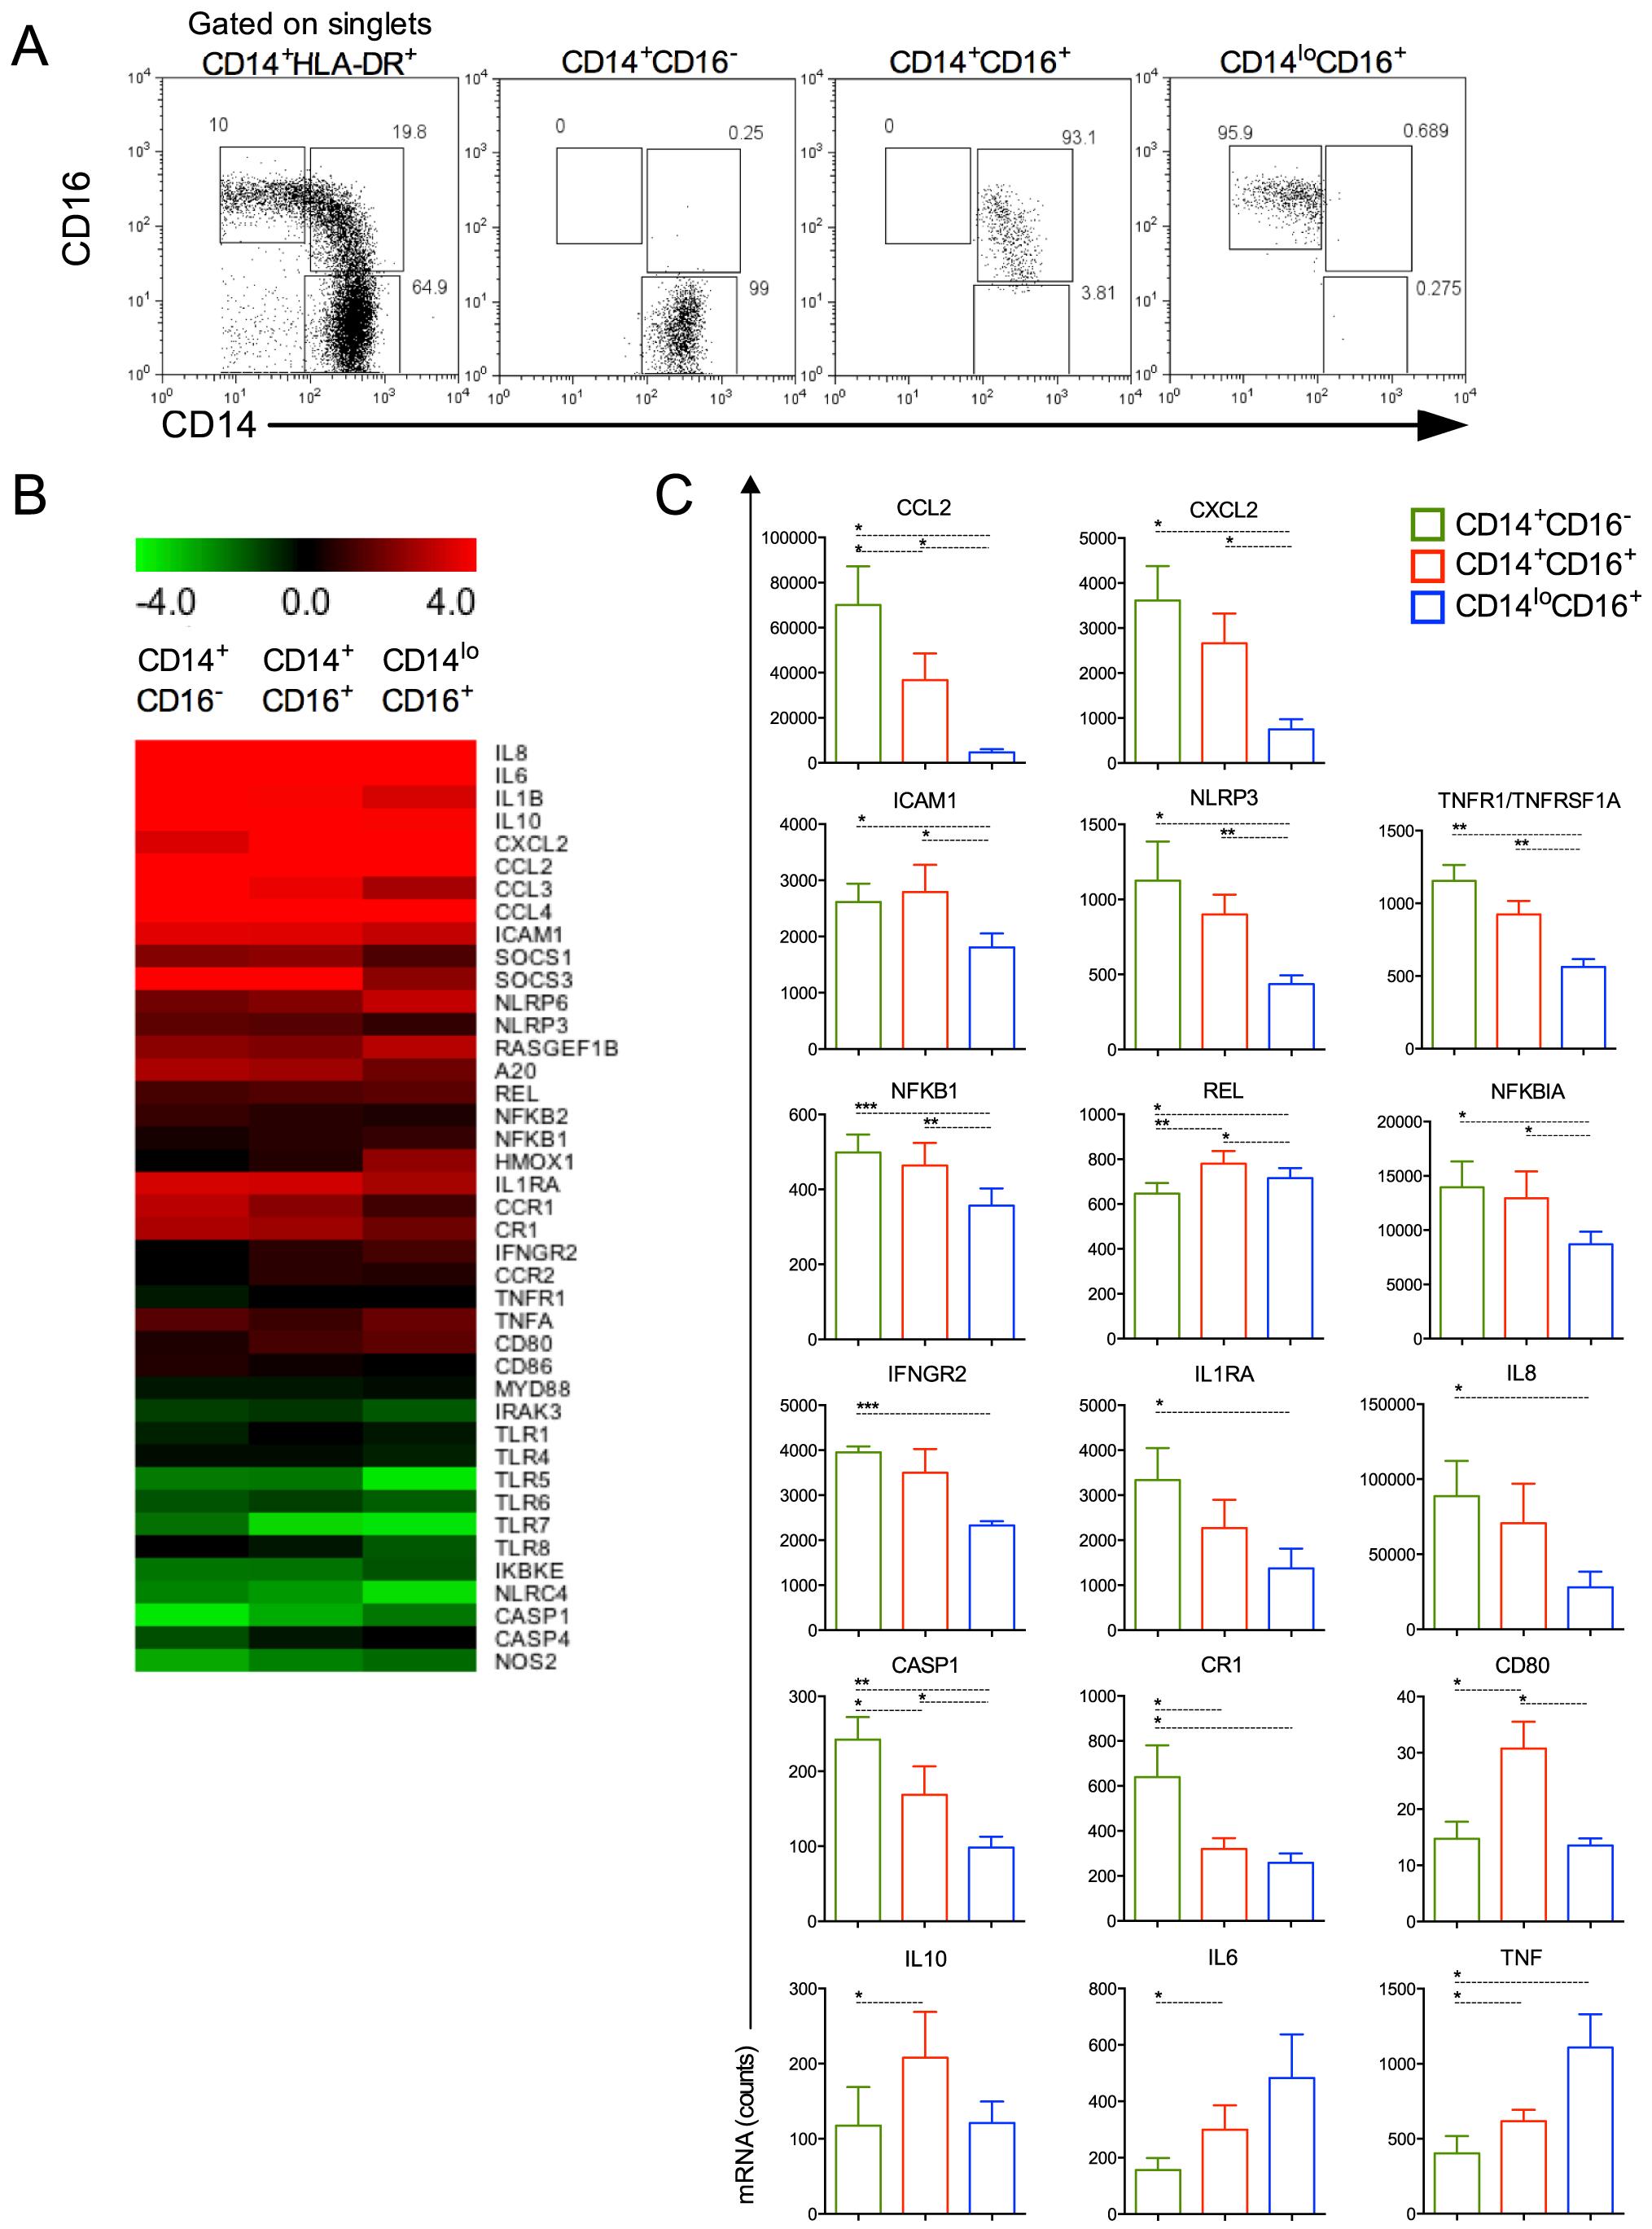 Monocyte subsets display distinct gene expression.